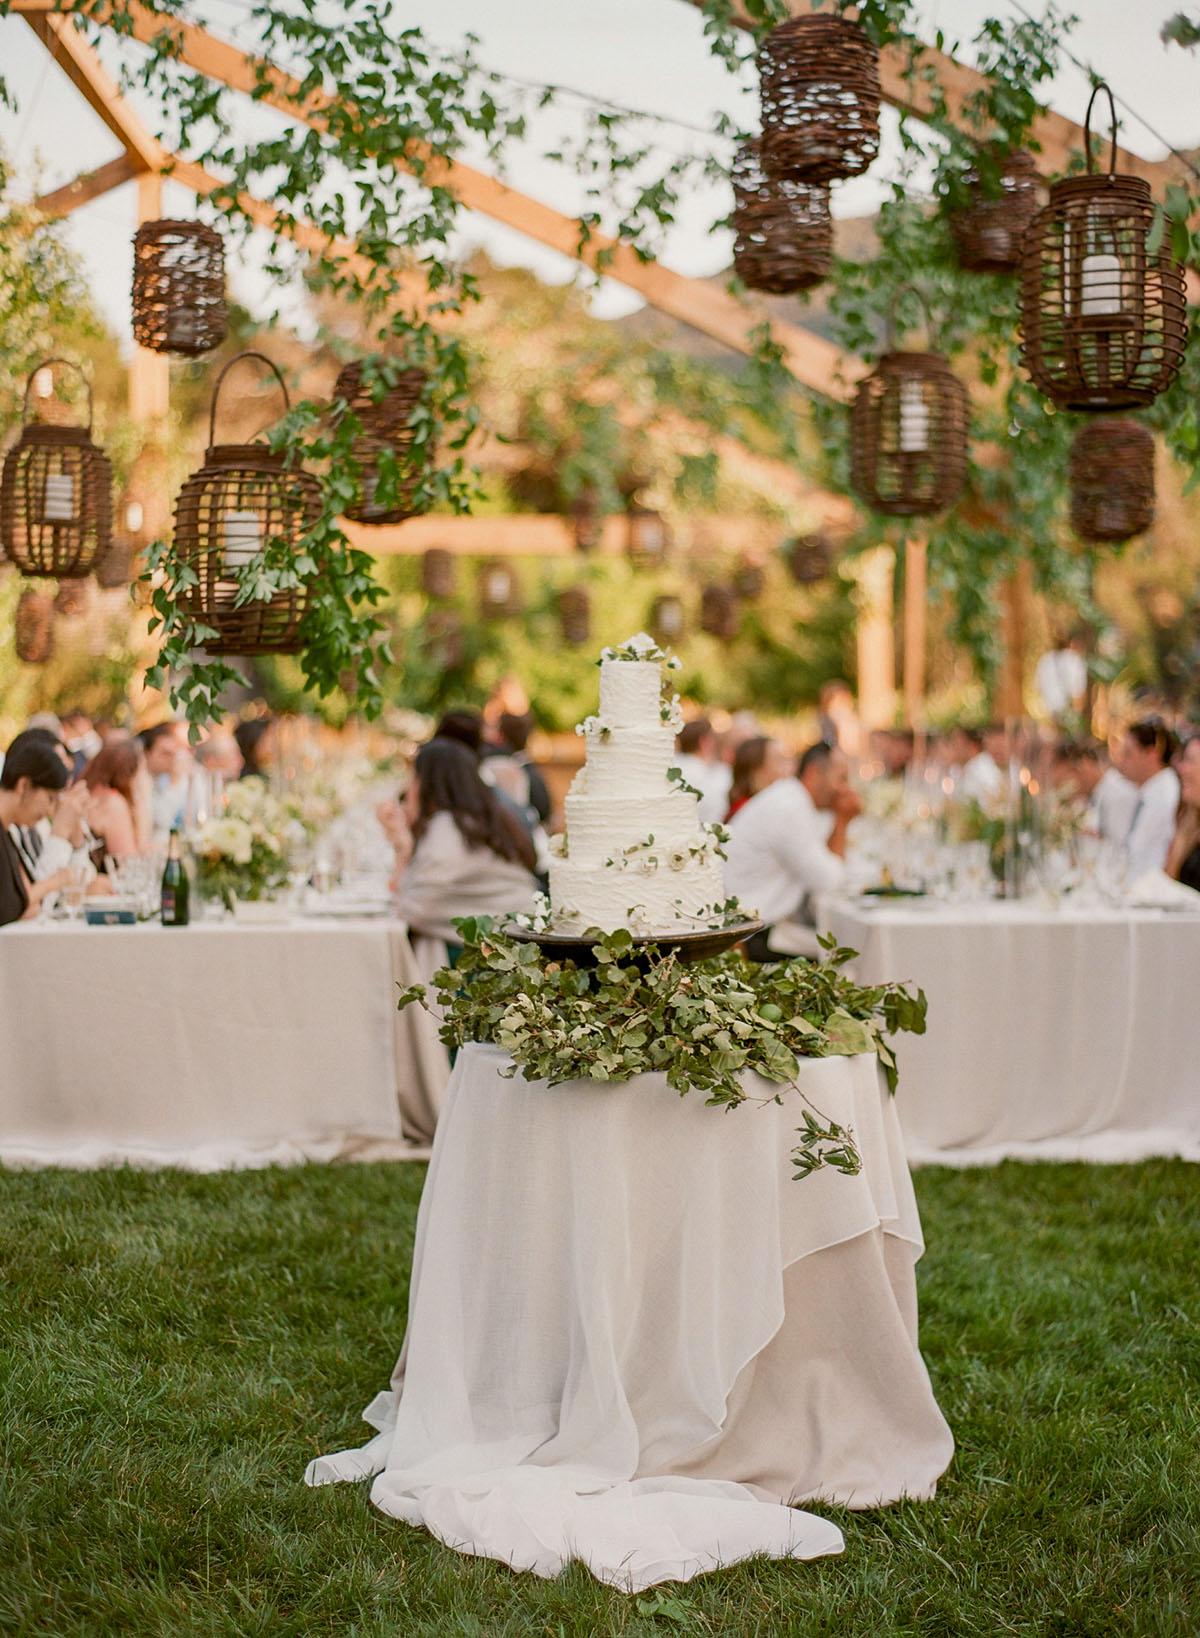 61-rustic-wedding-cake.jpg